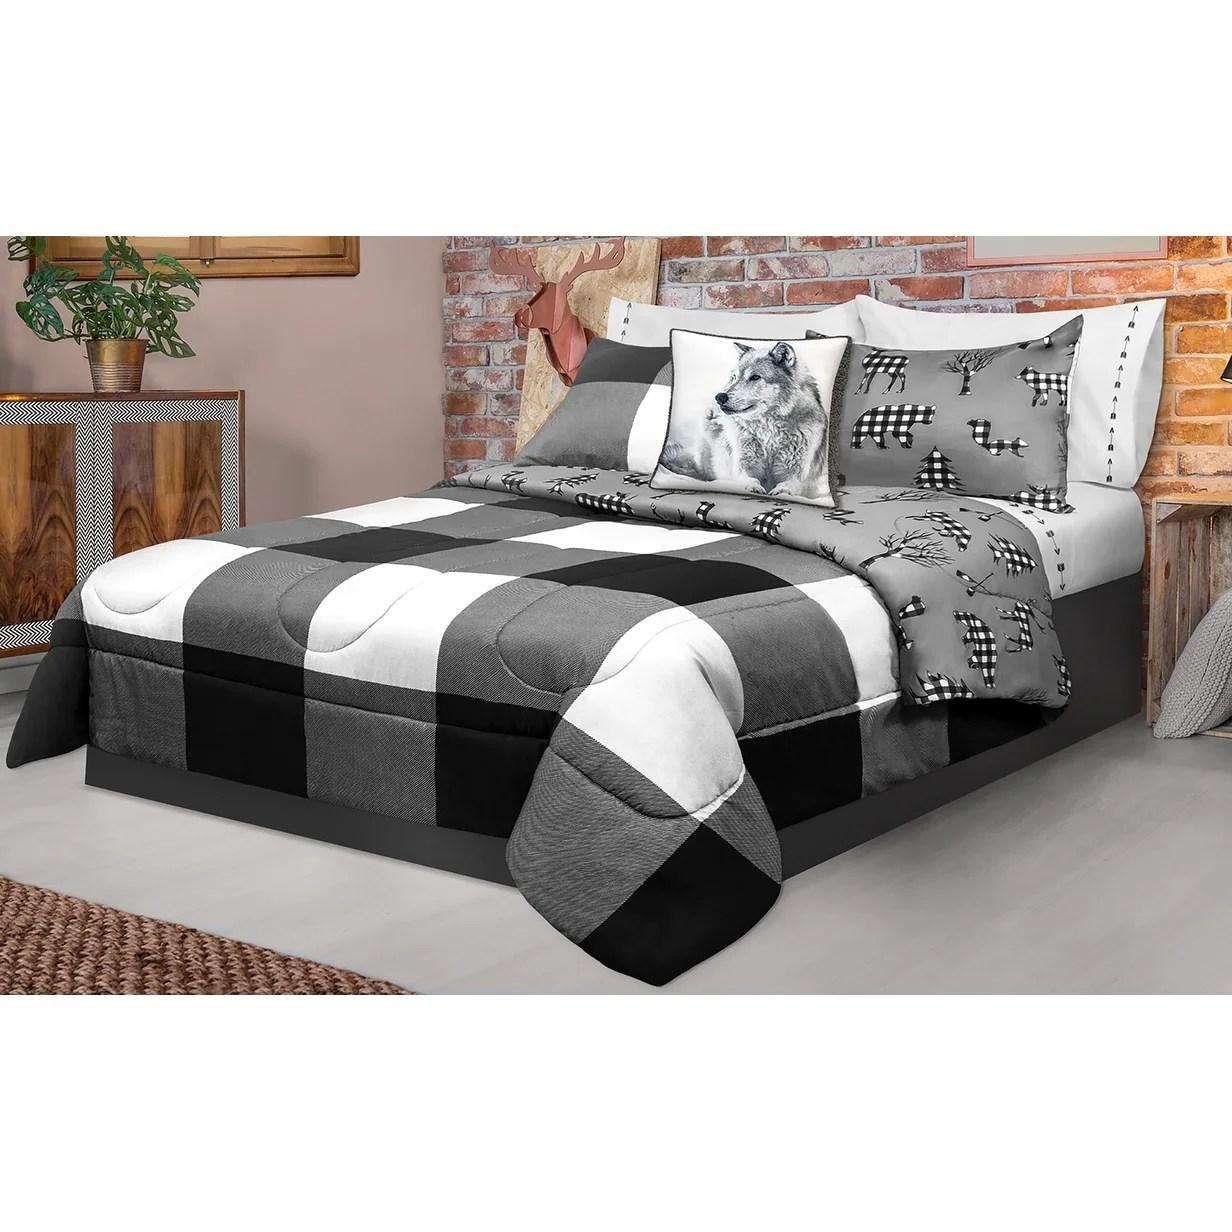 comforter 2 piece set twin printed buffalo plaid white black